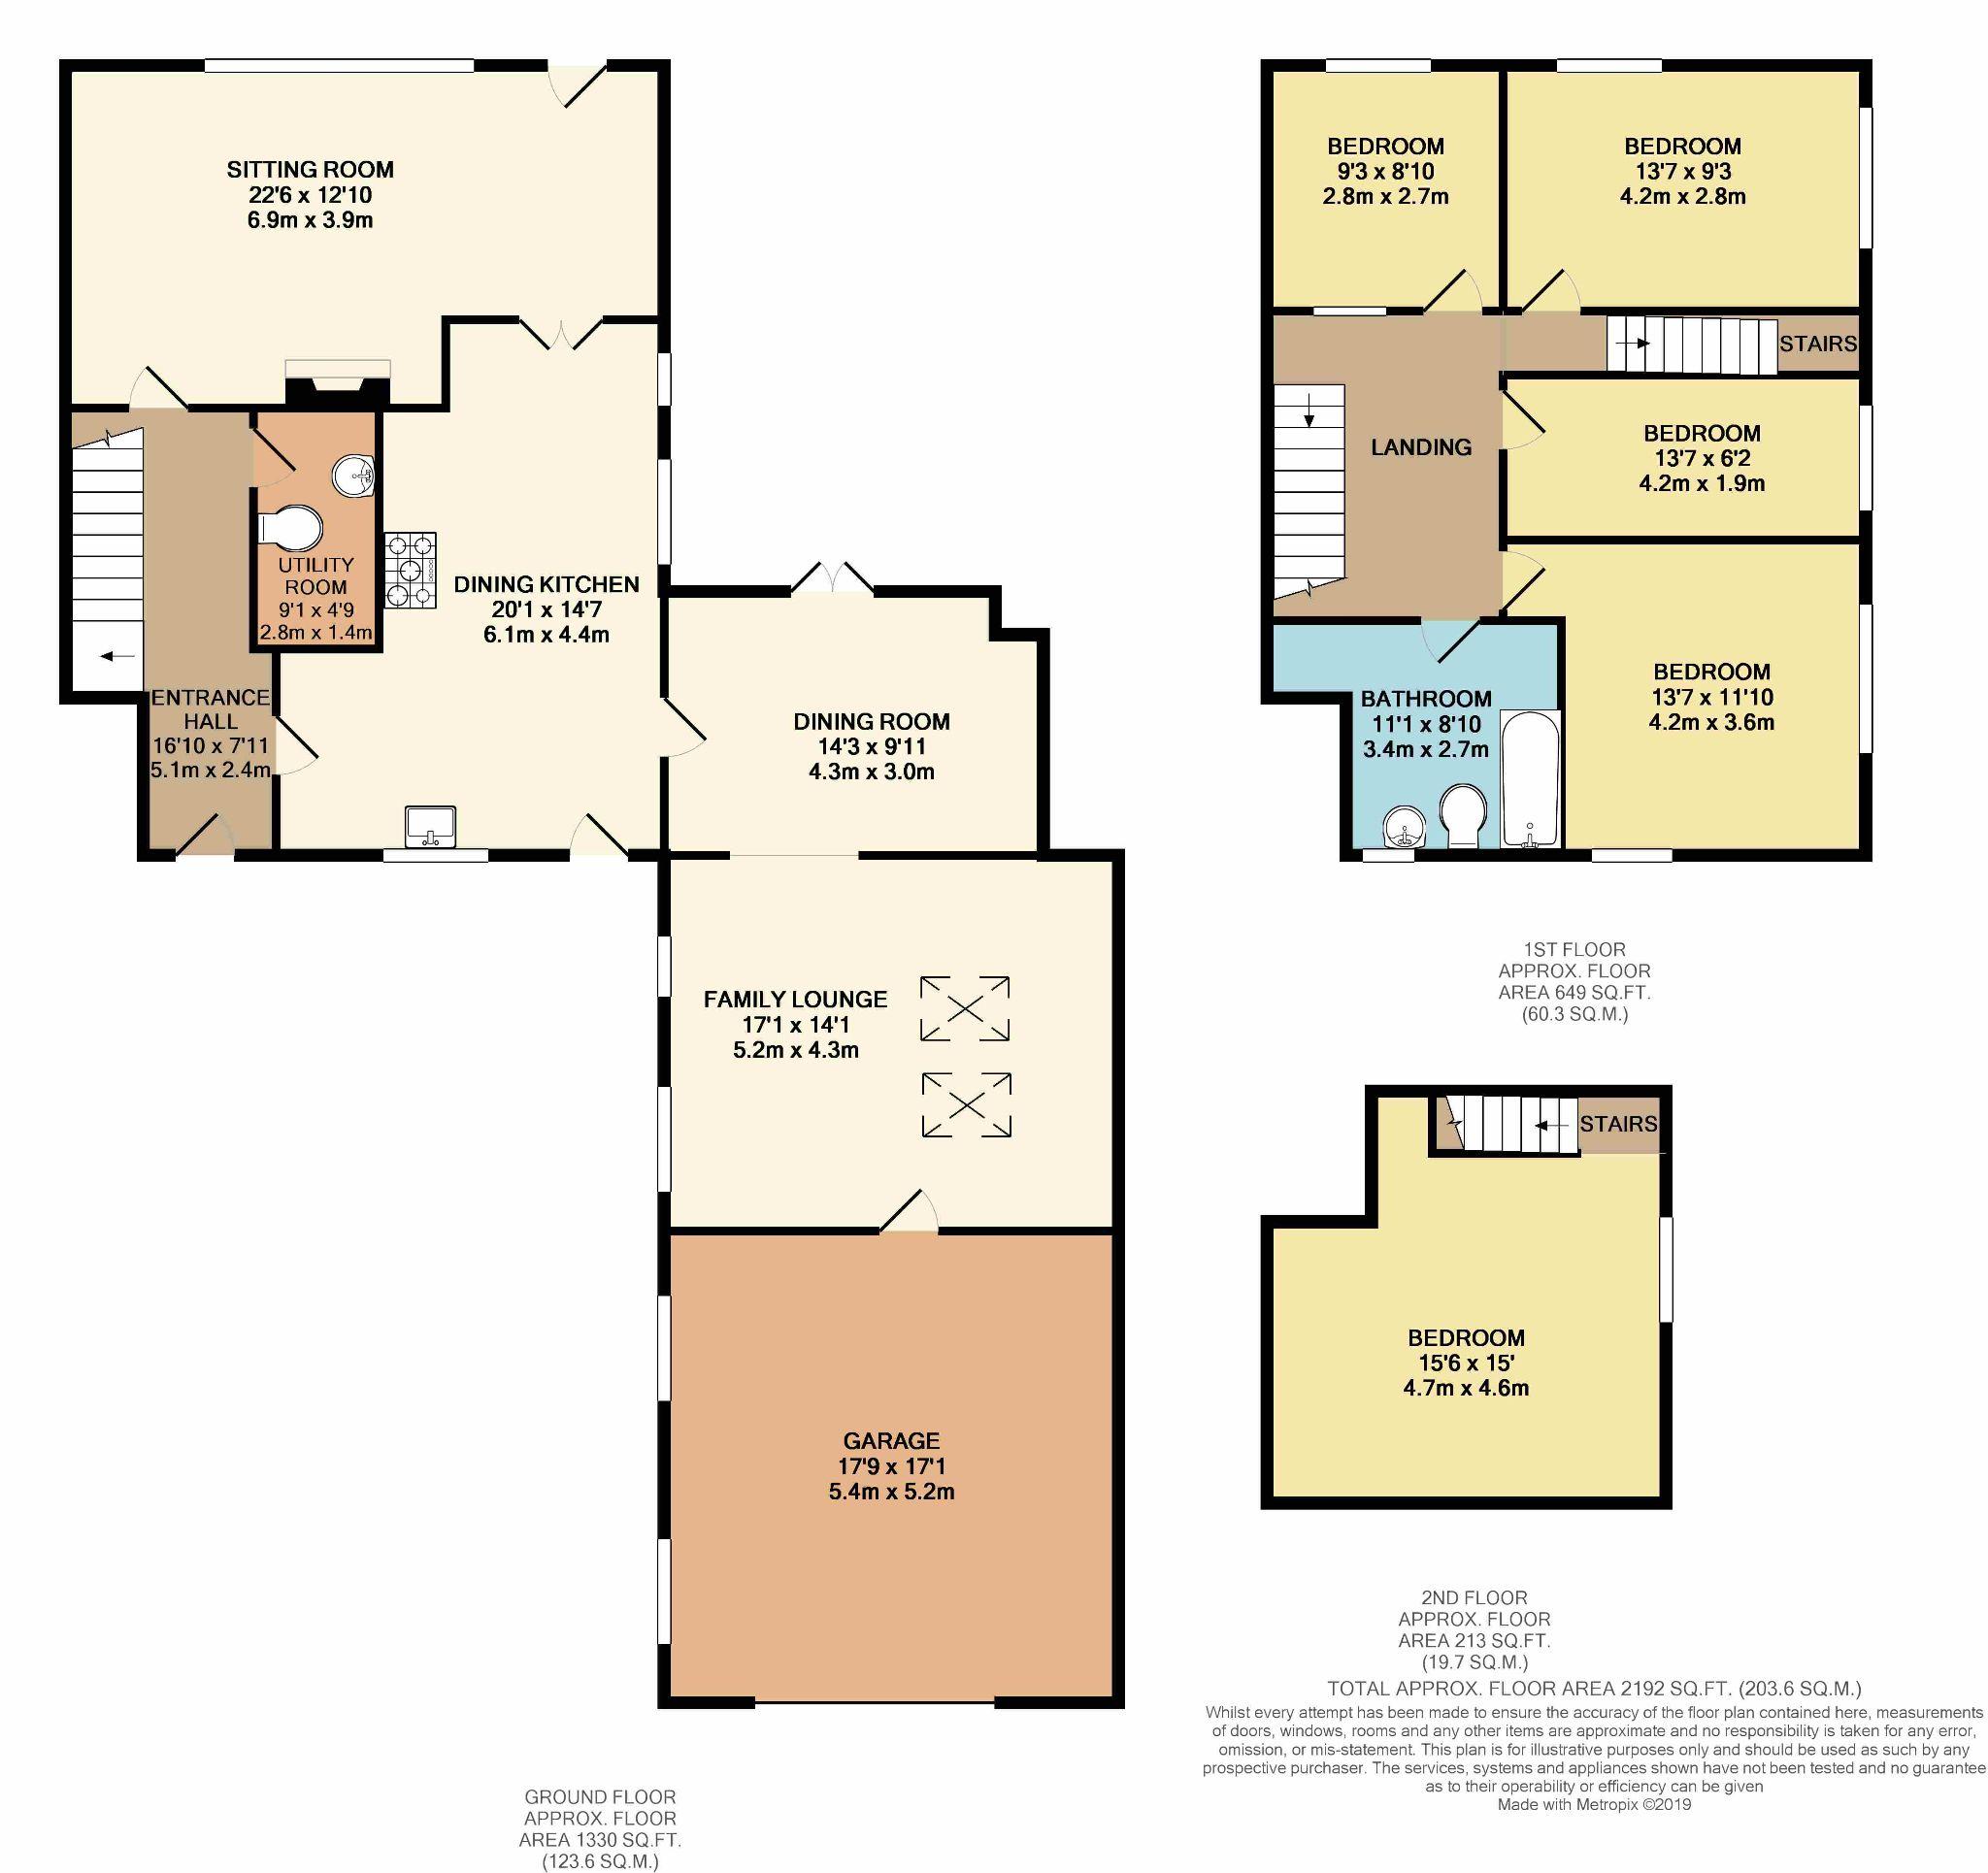 5 bedroom barn conversion house SSTC in Hebden Bridge - Floorplan 1